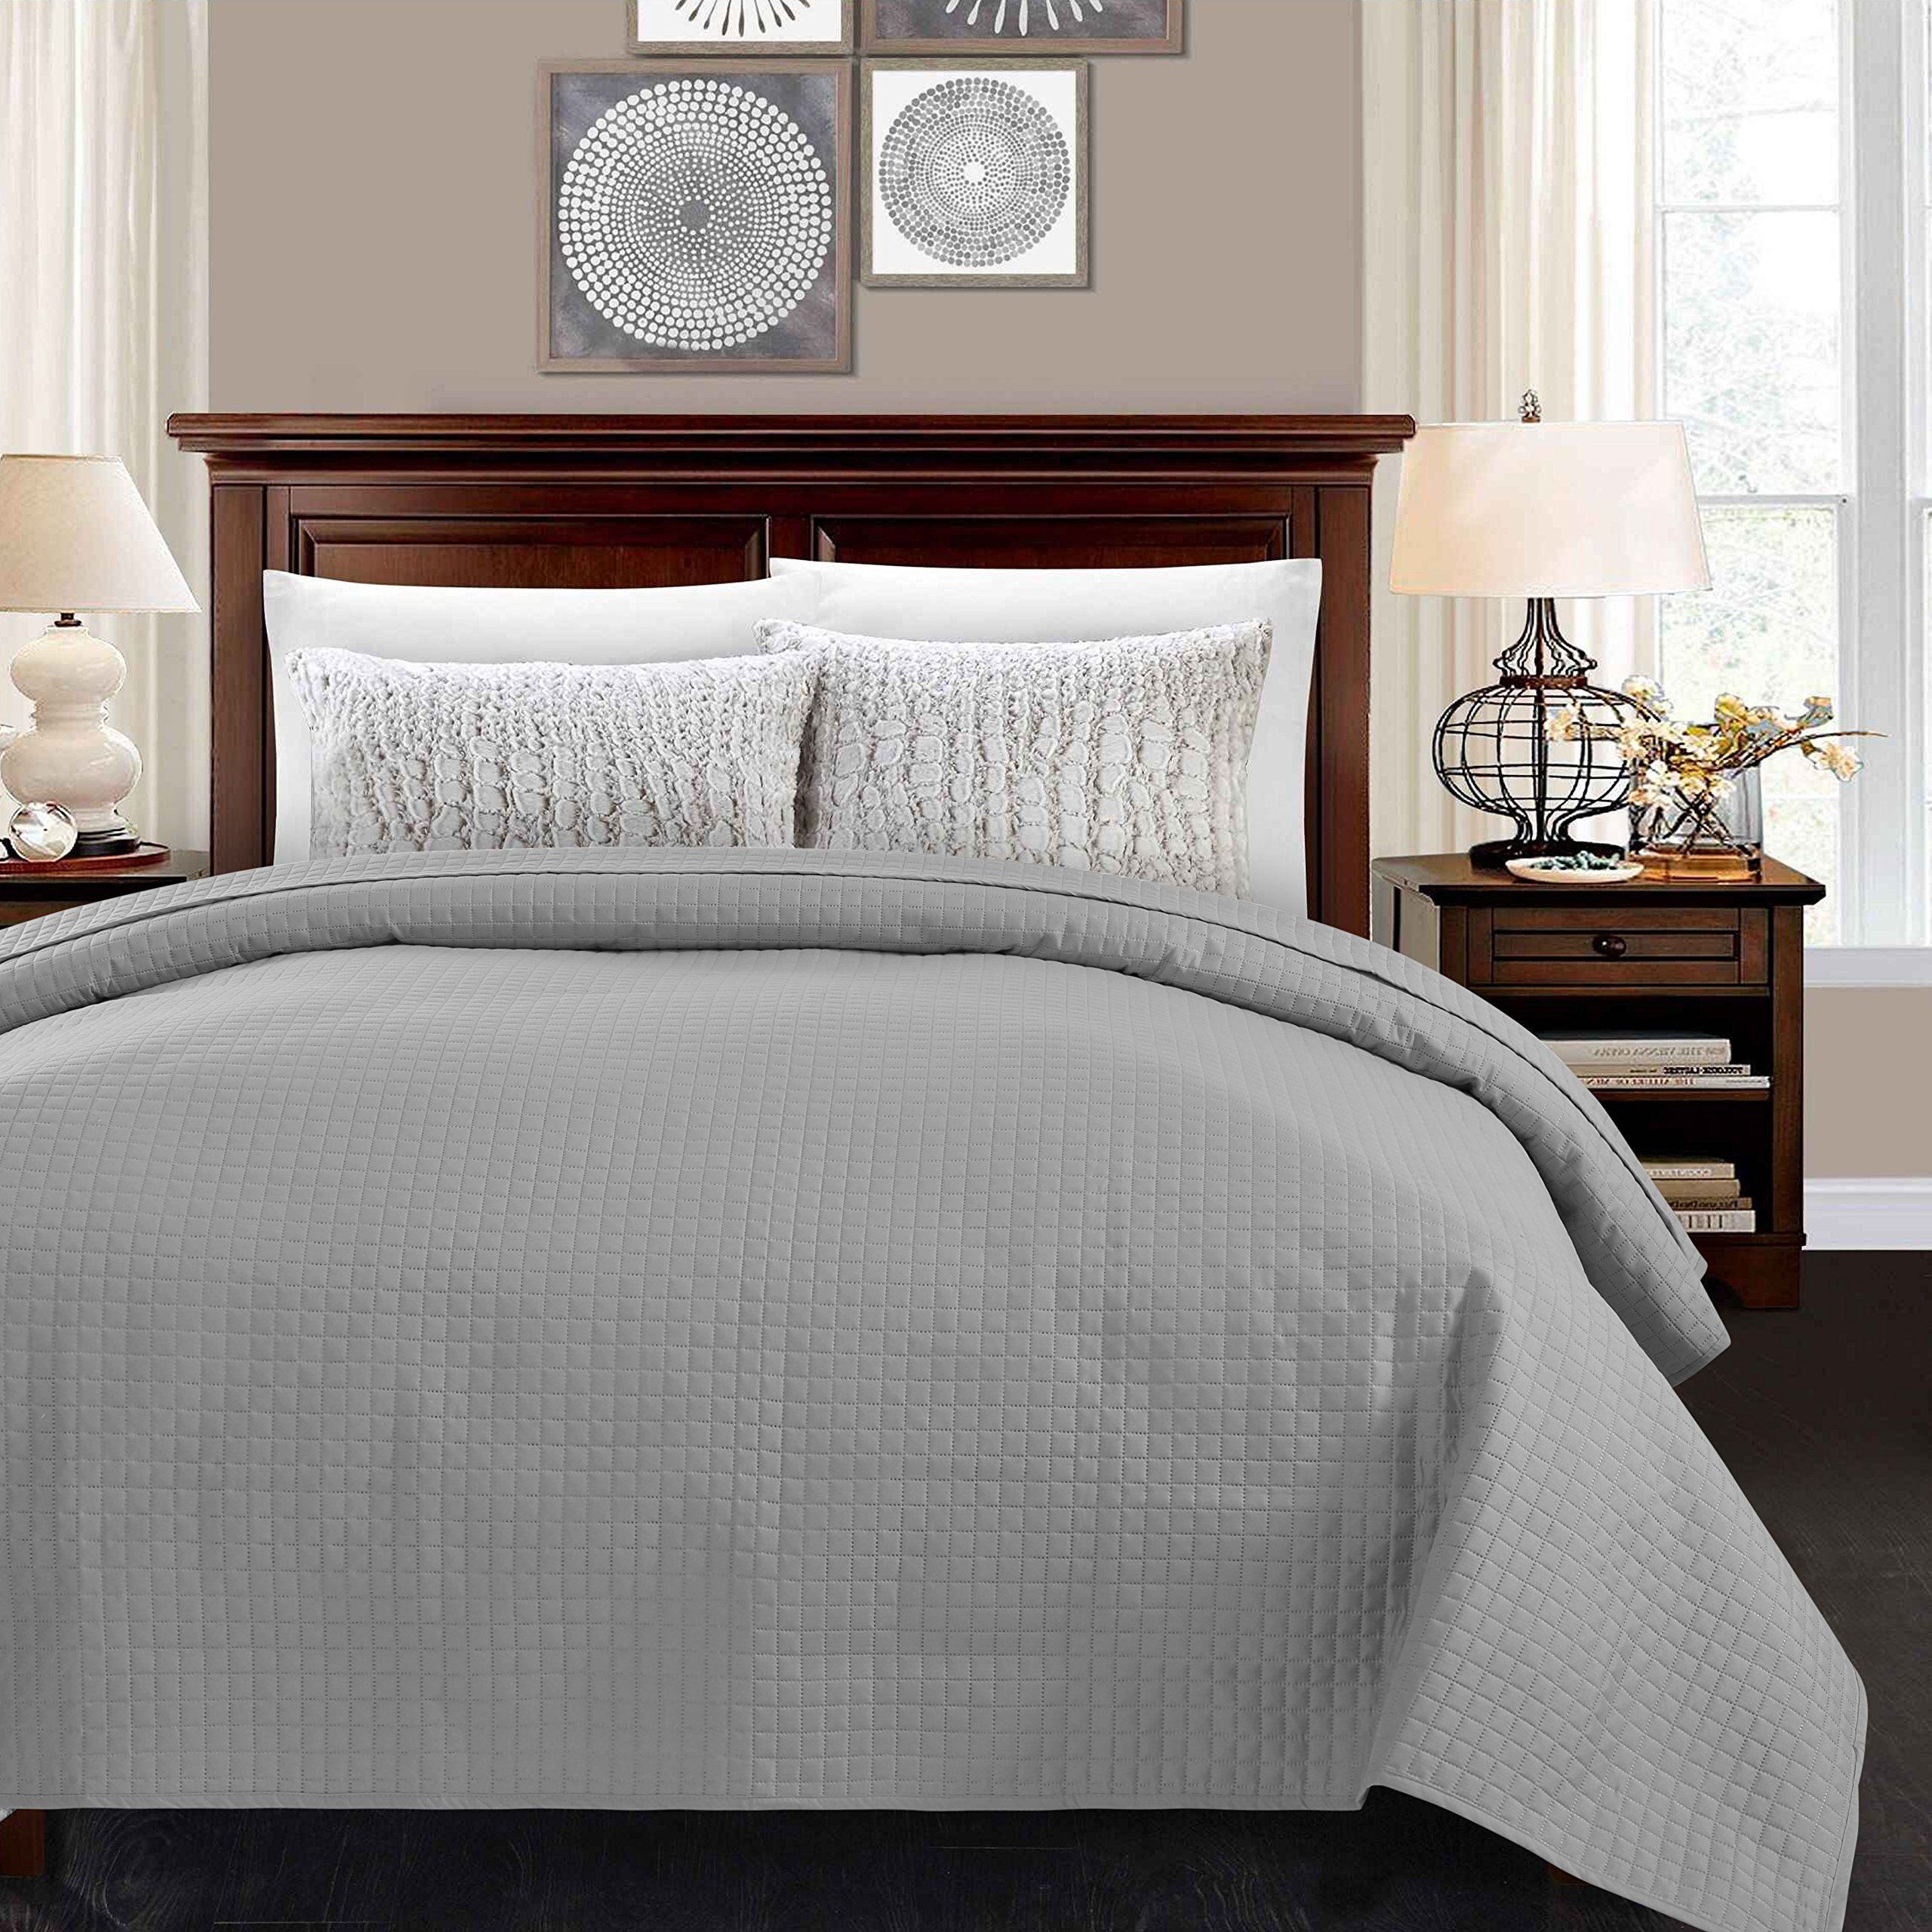 ALPHA HOME Lightweight Bed Quilt, Classical Pattern Comforter Bedspread Coverlet Blanket - Queen Size, Grey